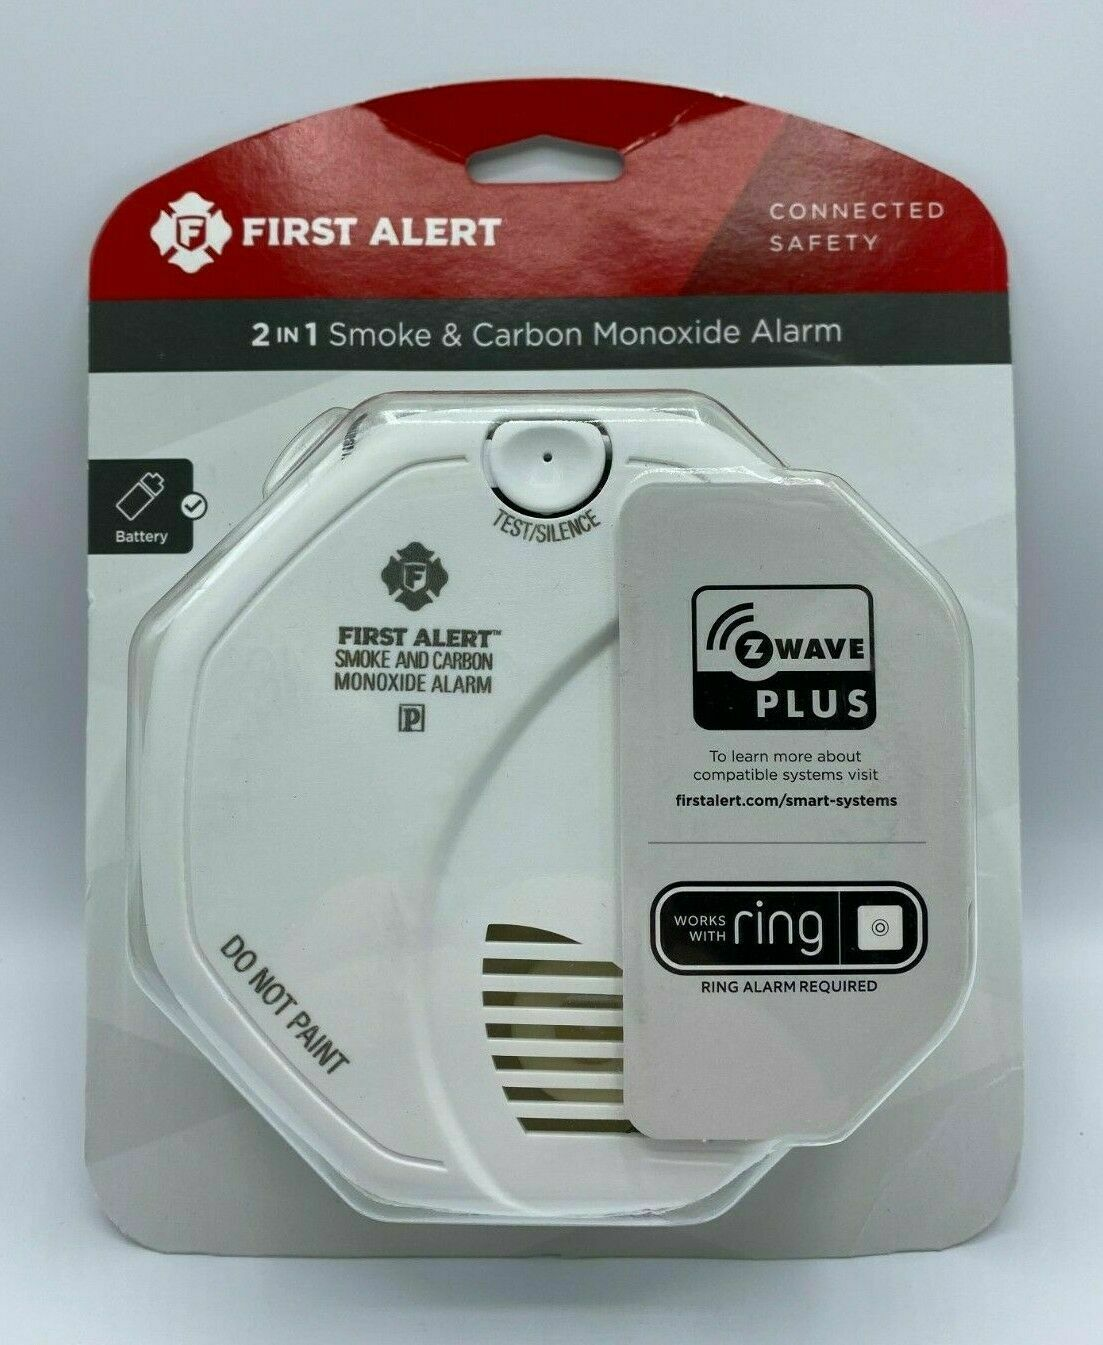 First Alert Z-Wave Plus Smoke and Carbon Monoxide Alarm - Ba